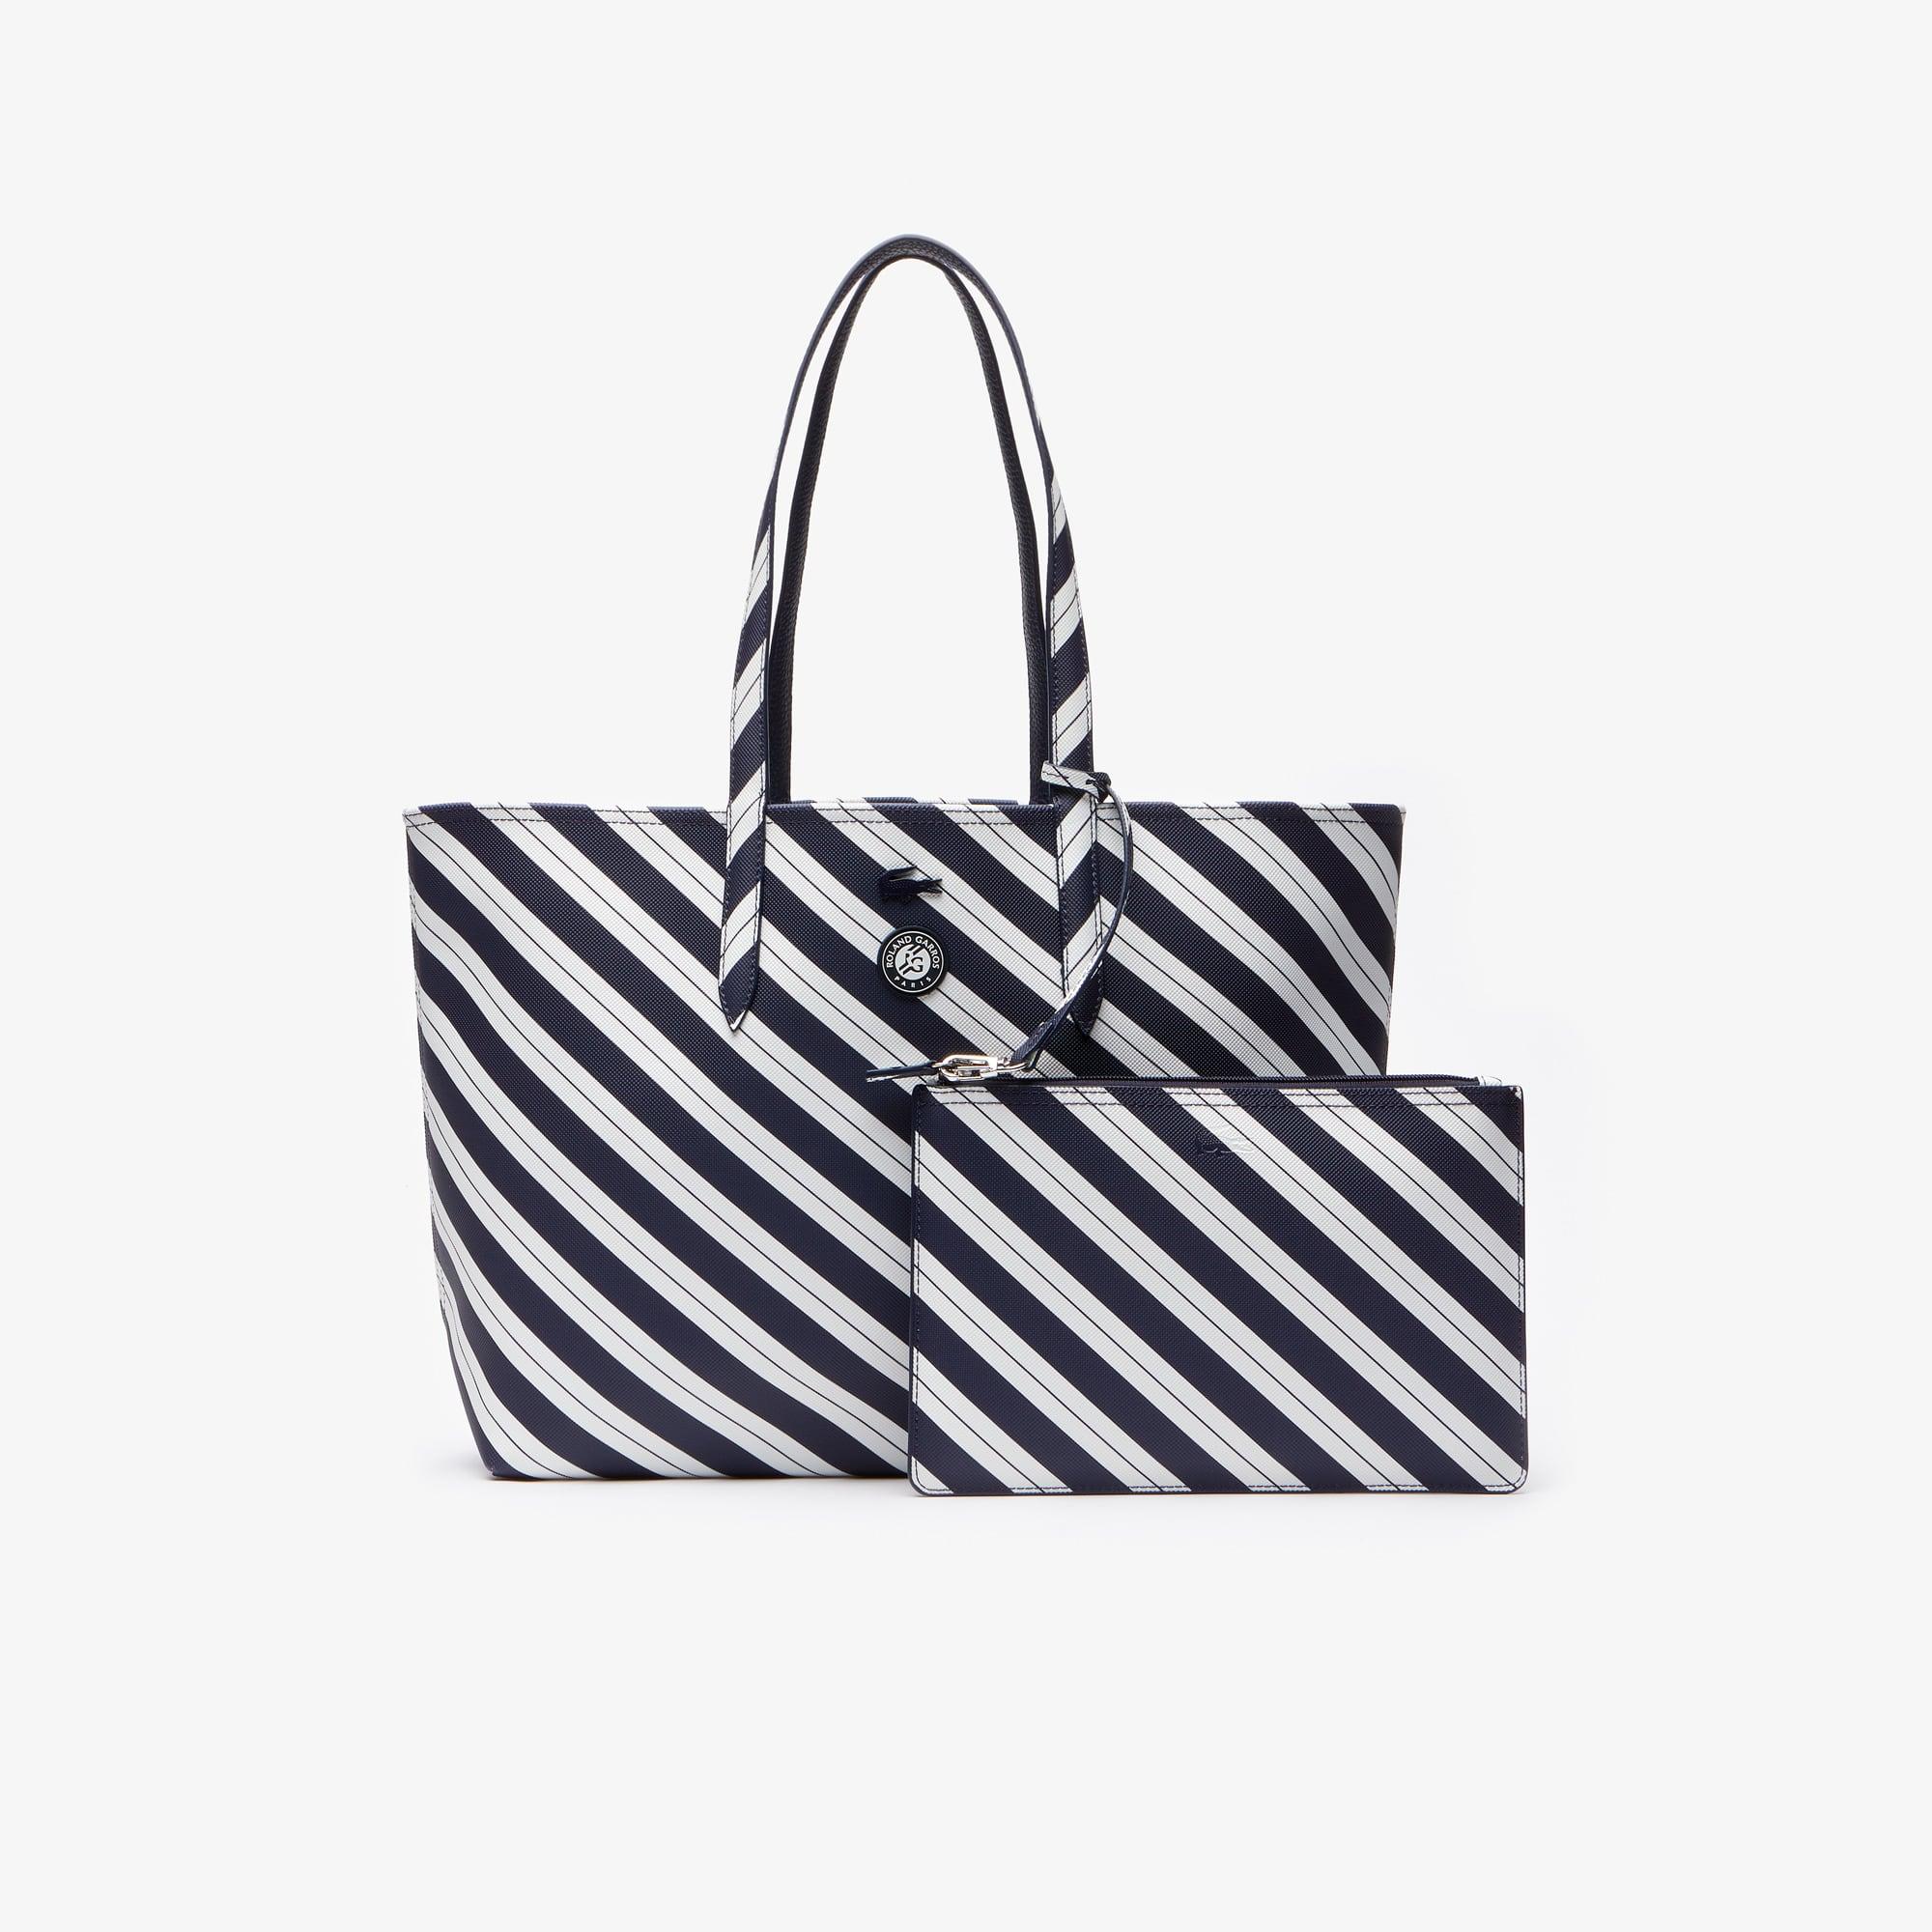 Reversible Print Women's Bag Lacoste Tote Tpuxozik Sport Open French X8n0NwPkO